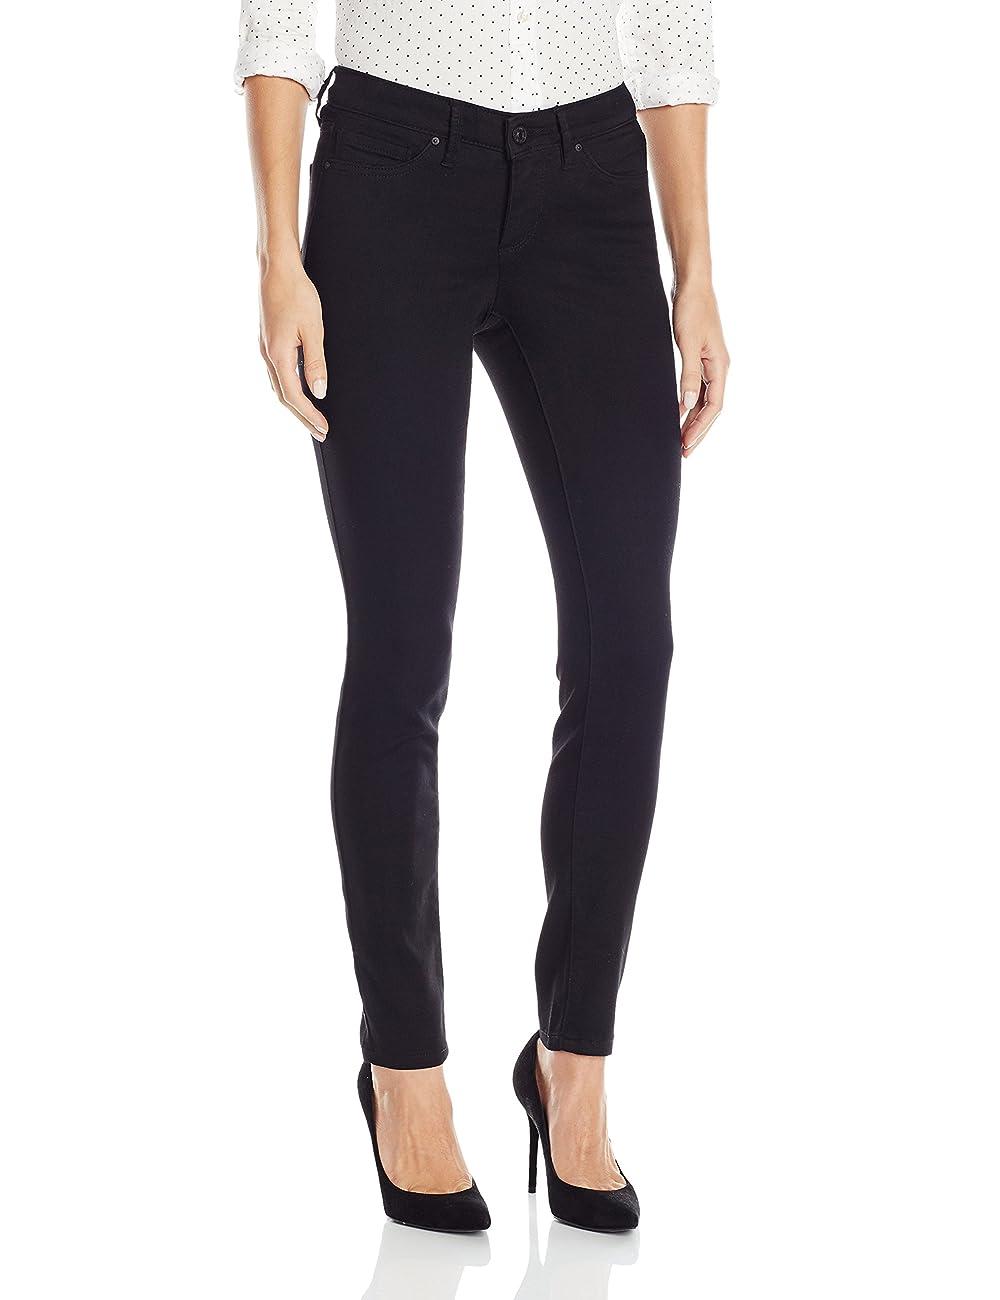 Vintage America Blues Women's Plus Size Boho Skinny Jean 0